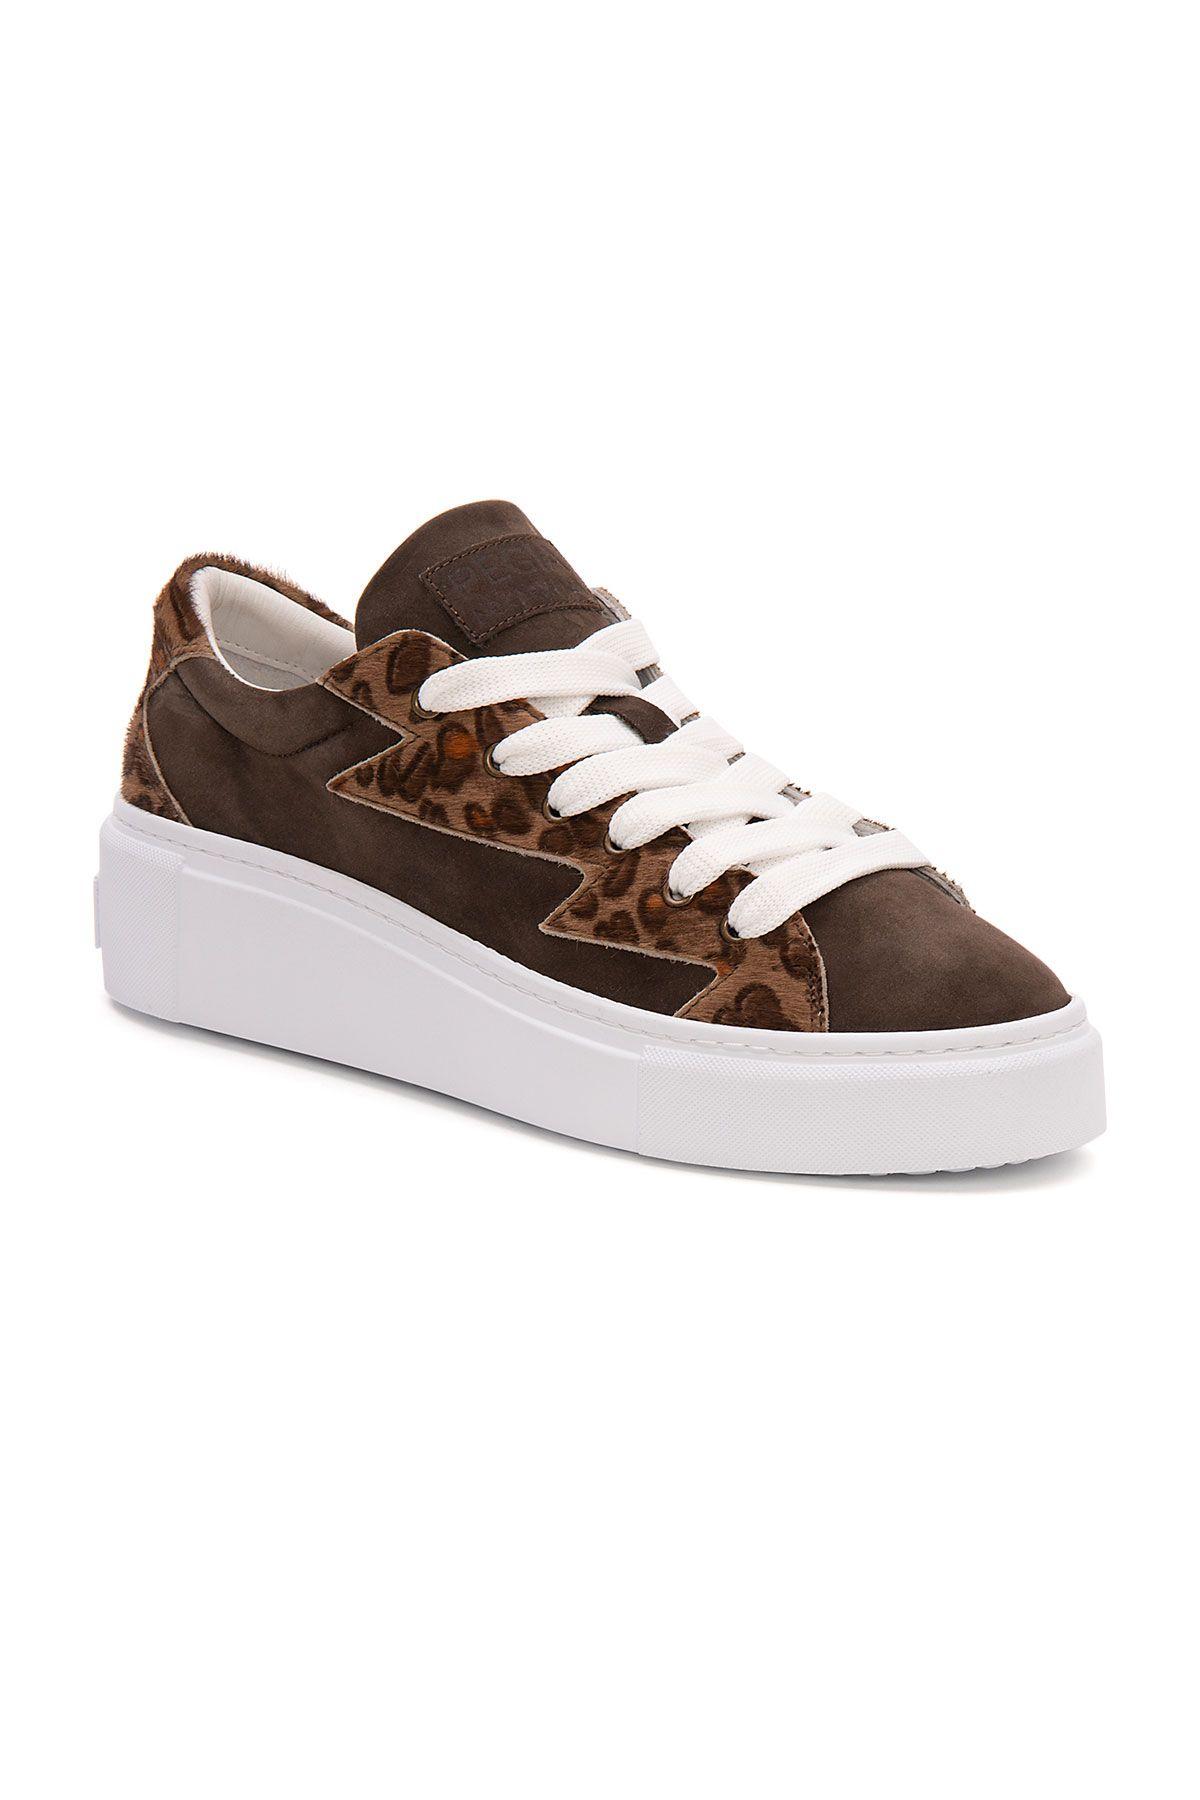 Pegia Genuine Suede Women's Sneaker LA1508 Brown